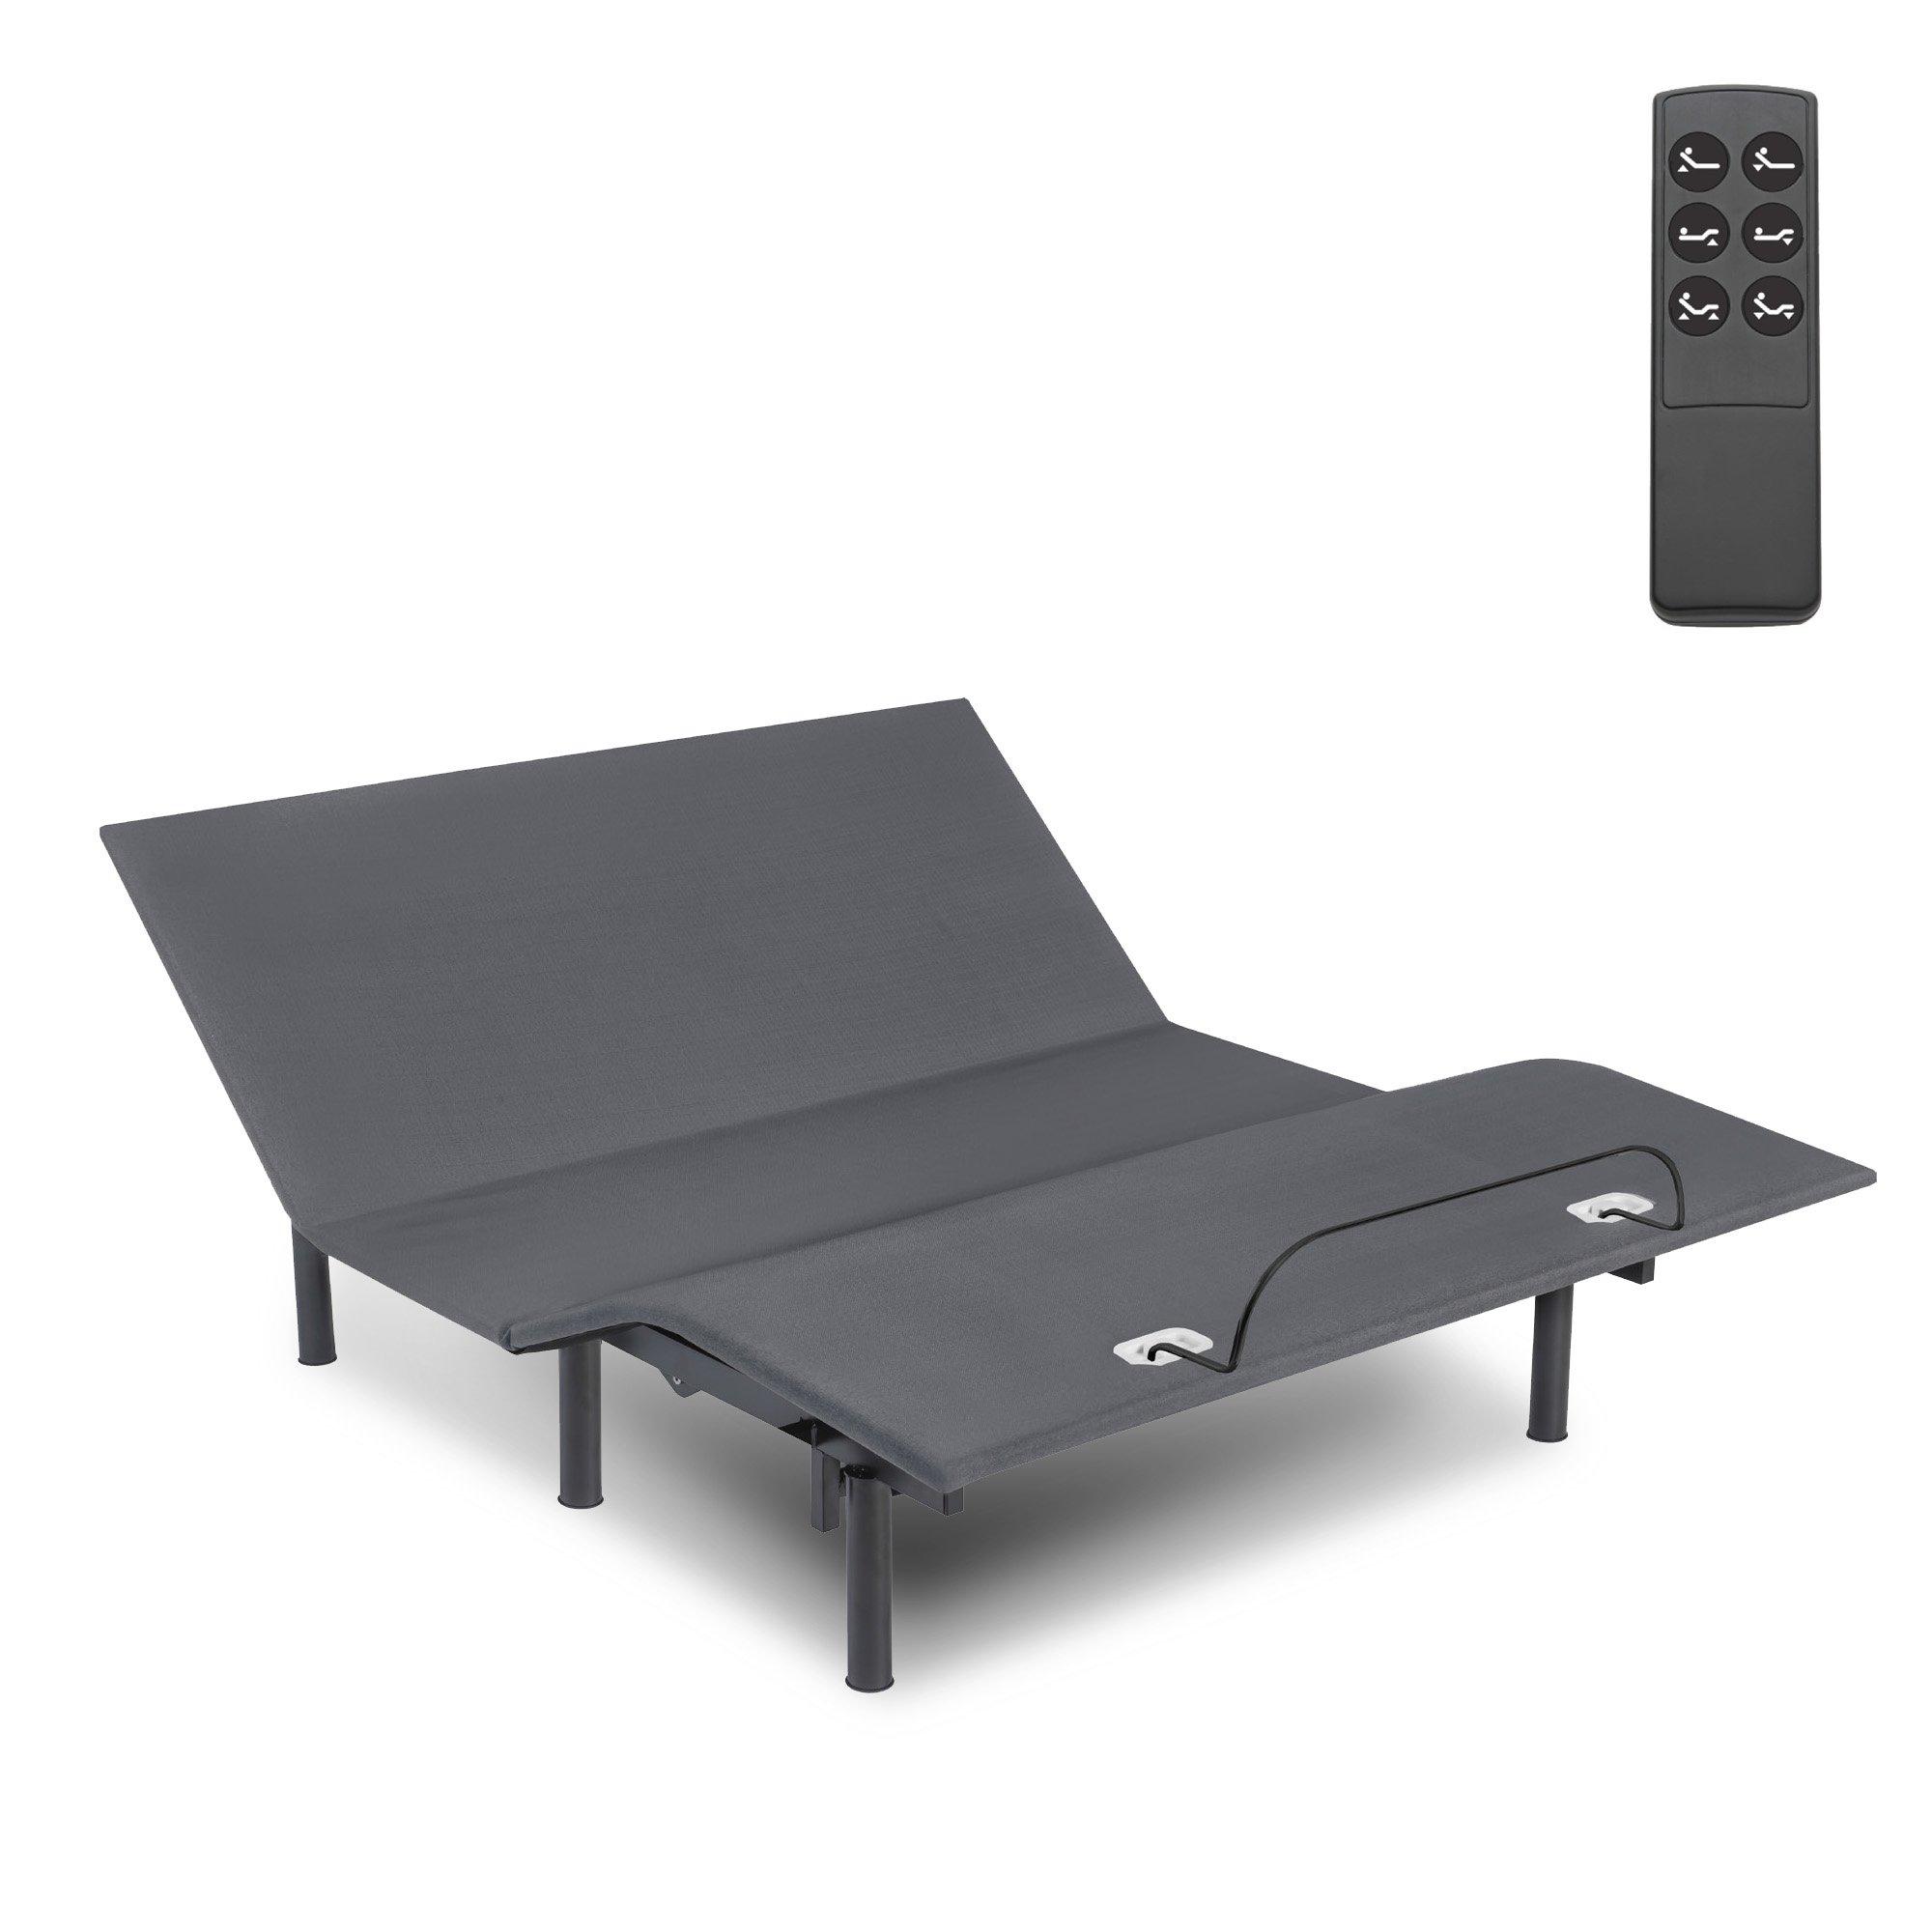 Fashion Bed Group 4X0060 Symmetry EZ Adjustable Base Bed, Twin XL, Dark Gray